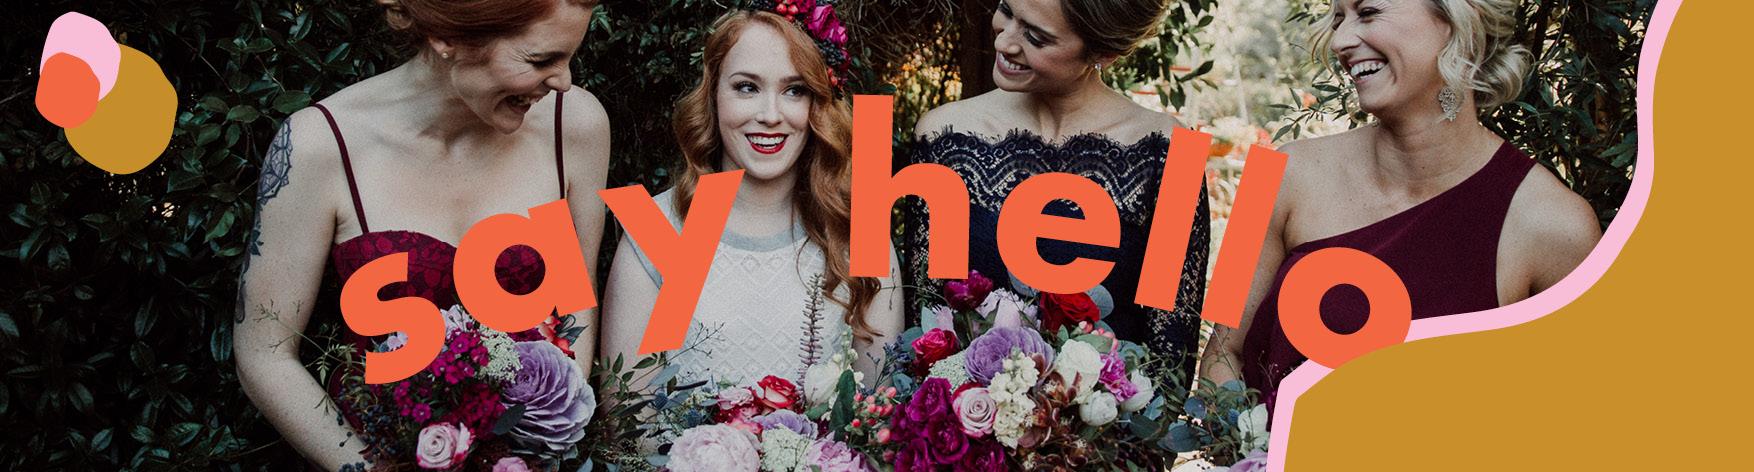 say hello banner.jpg